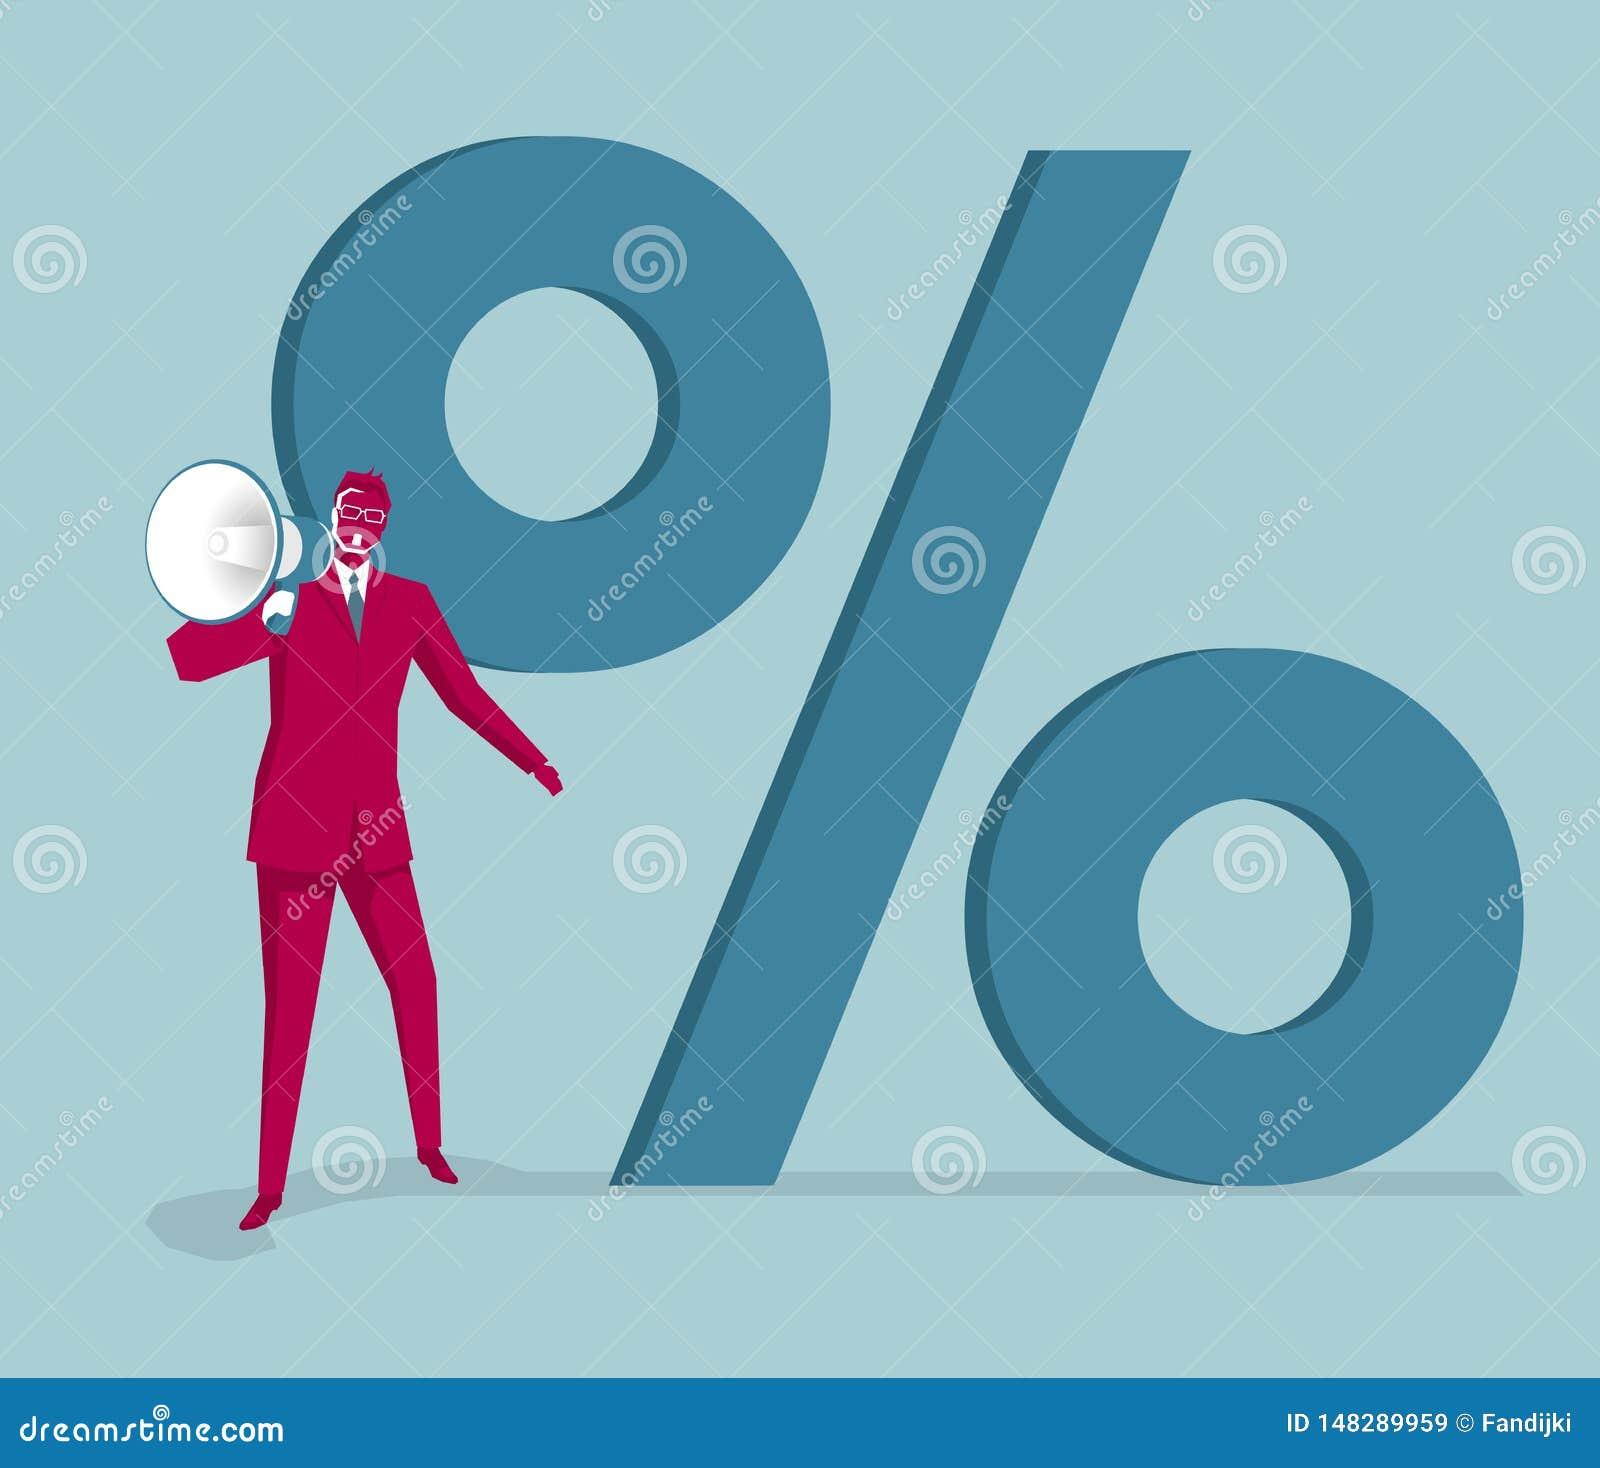 Businessman holding megaphone before the percentage symbol.